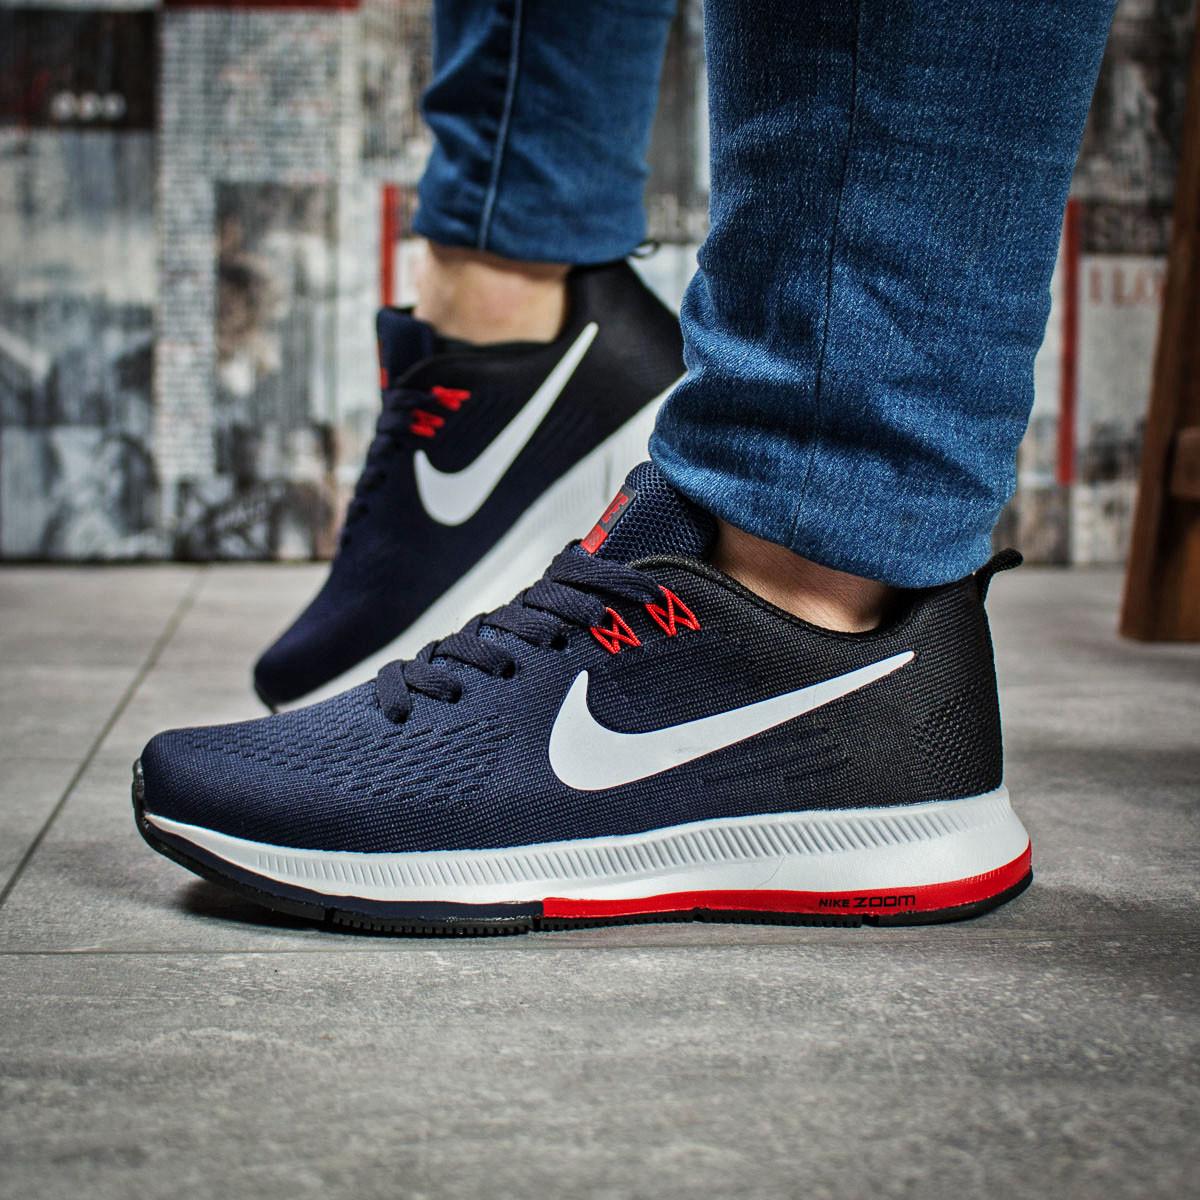 Кроссовки женские 16033, Nike Zoom Pegasus, темно-синие, < 37 39 > р.37-23,0